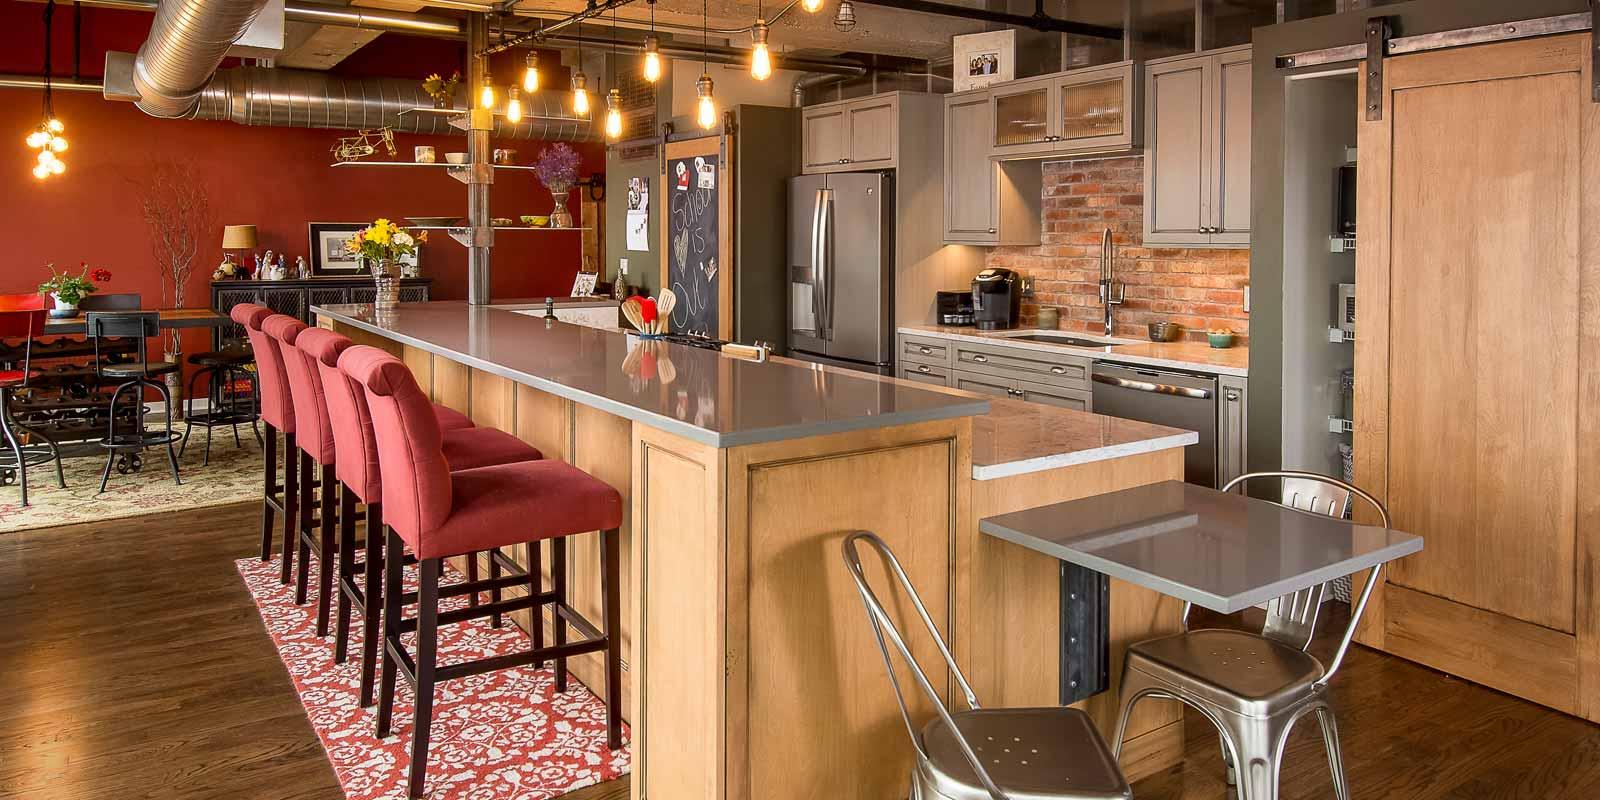 Spaces To Love Interiors Interior Design Studio Des Moines Image May  Contain Person Table Interior Design Firms Des Moines Luxury Condominium  Interior ...